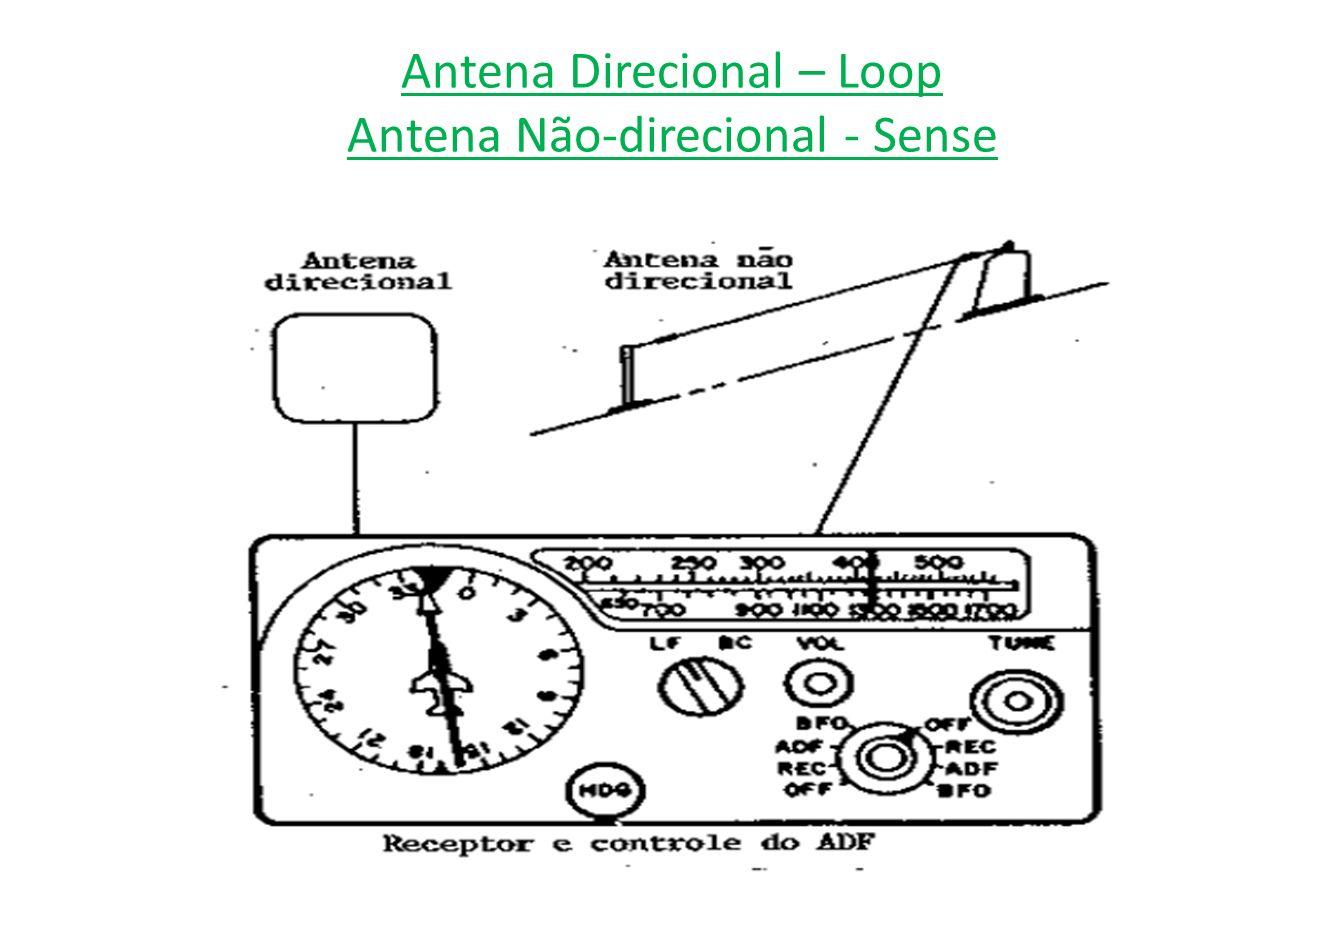 Antena Direcional – Loop